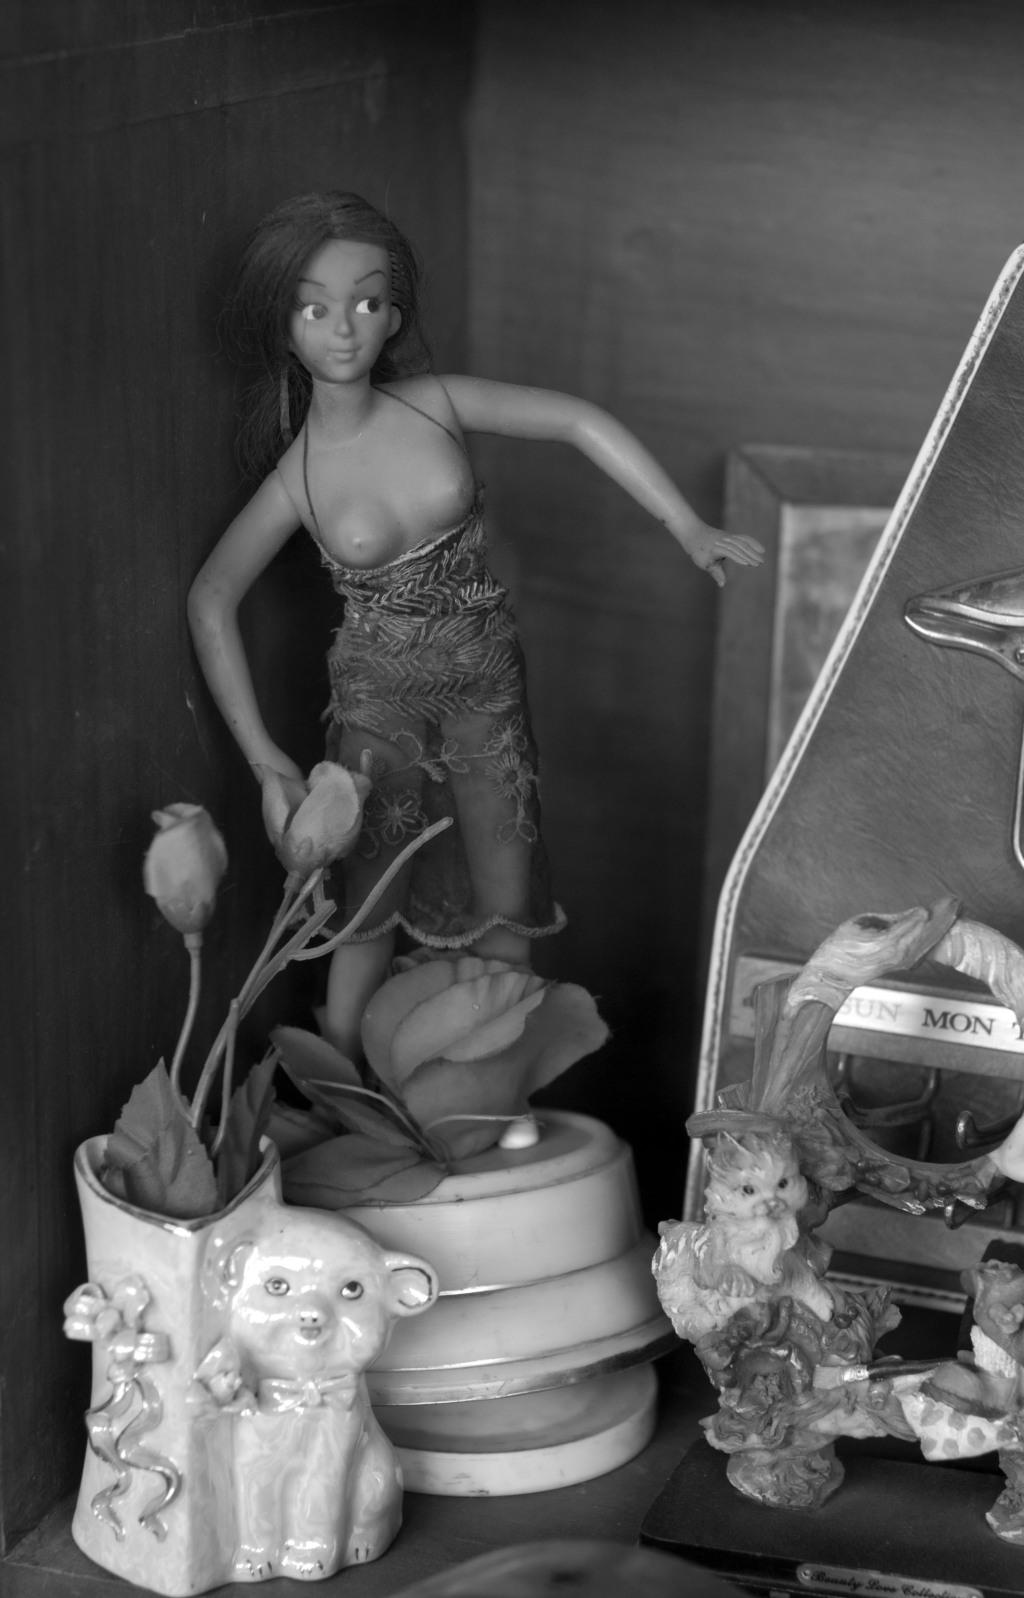 barbie, souk al gumaa, Cairo, Egypt, Photography